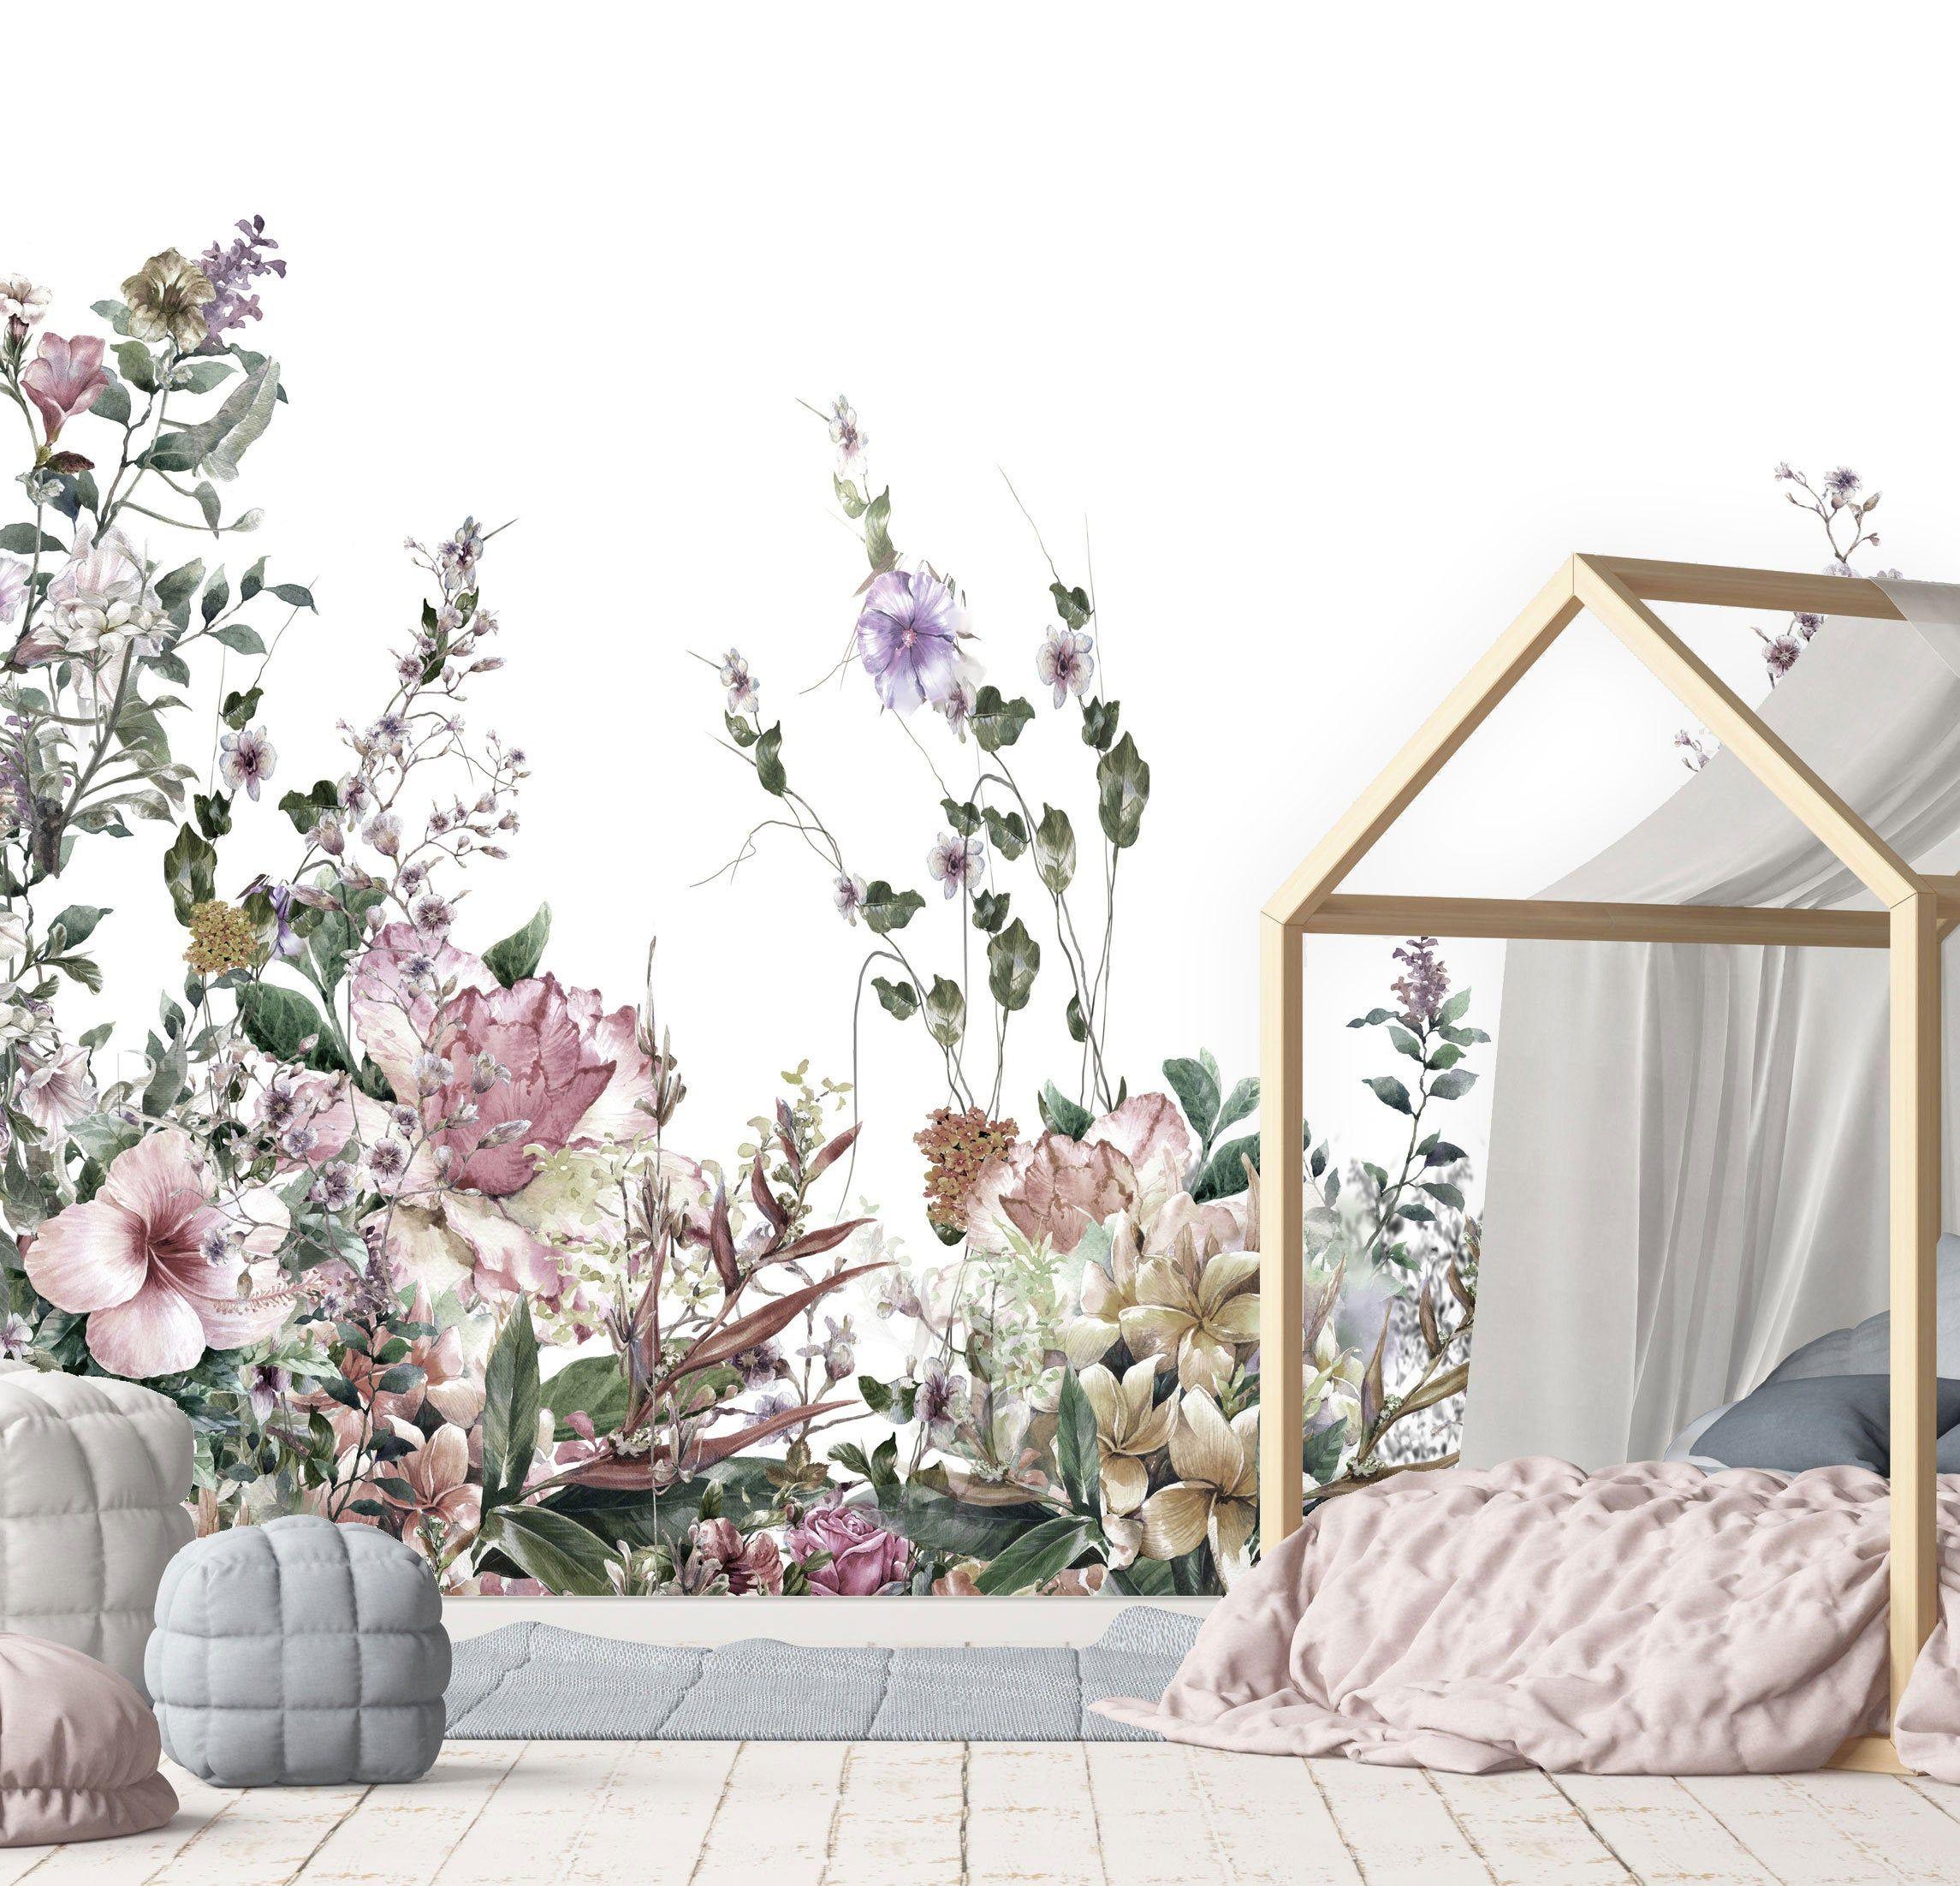 Blossom Spring Garden Wall Mural, Floral Wallpaper, Shabby ...